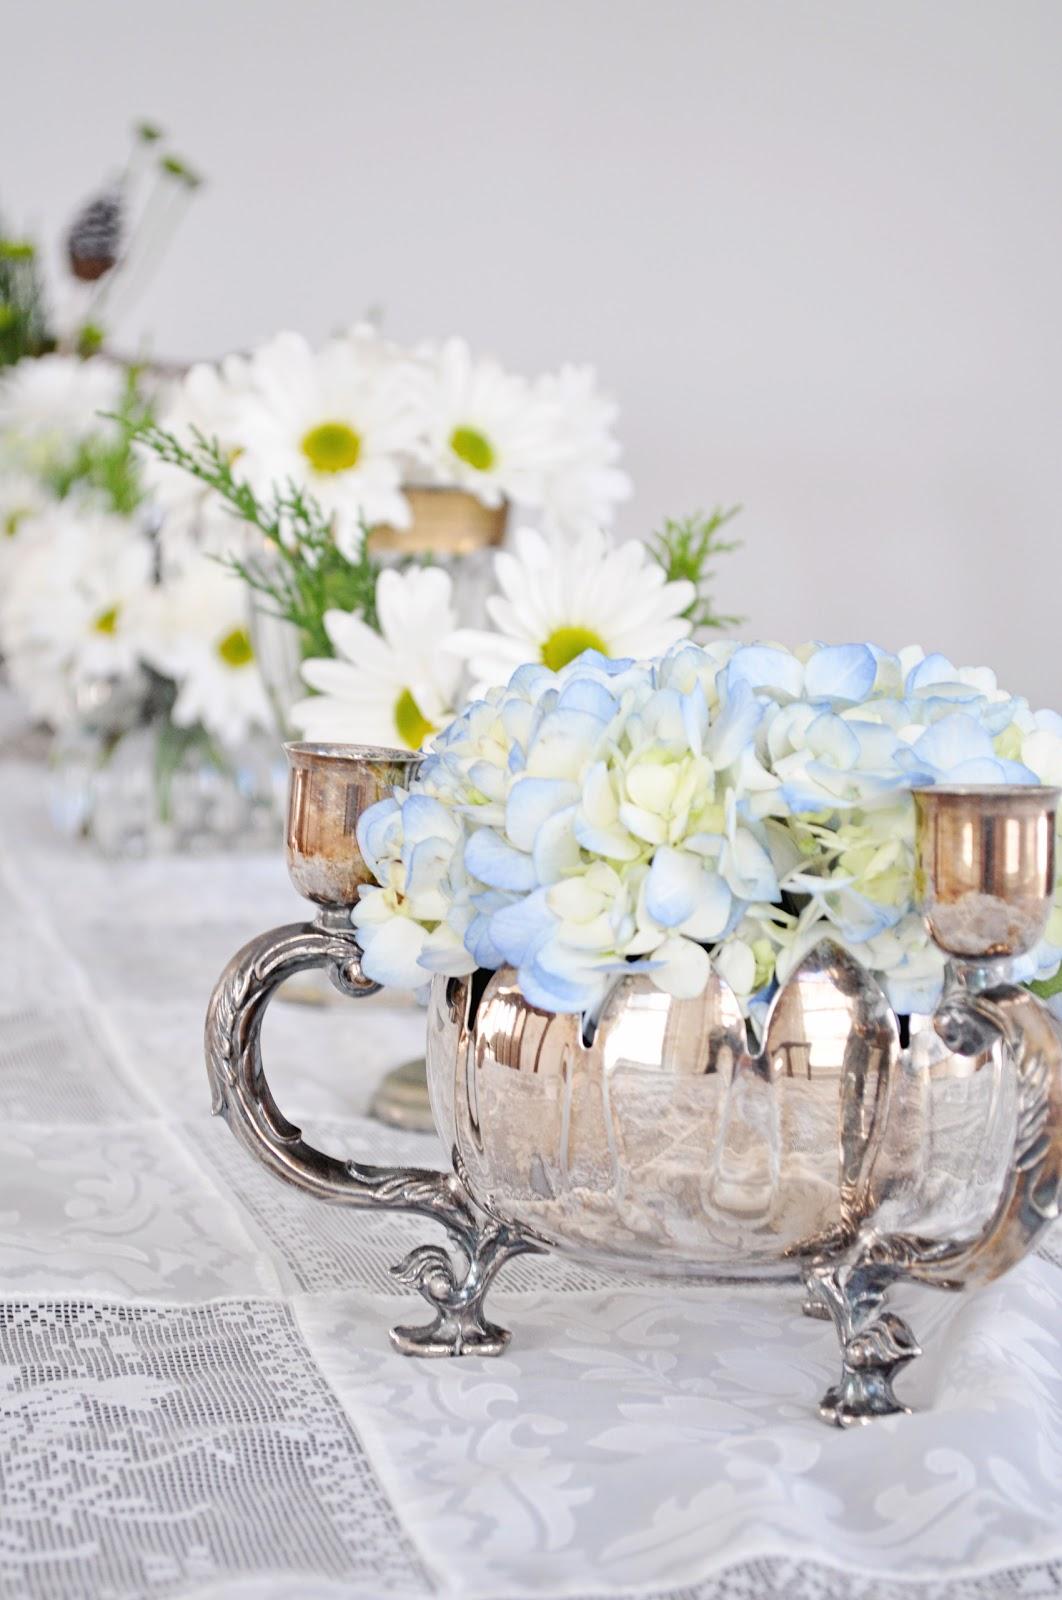 Athena & Eugenia: Winter Flower Arrangements: Daisies and Hydrangeas